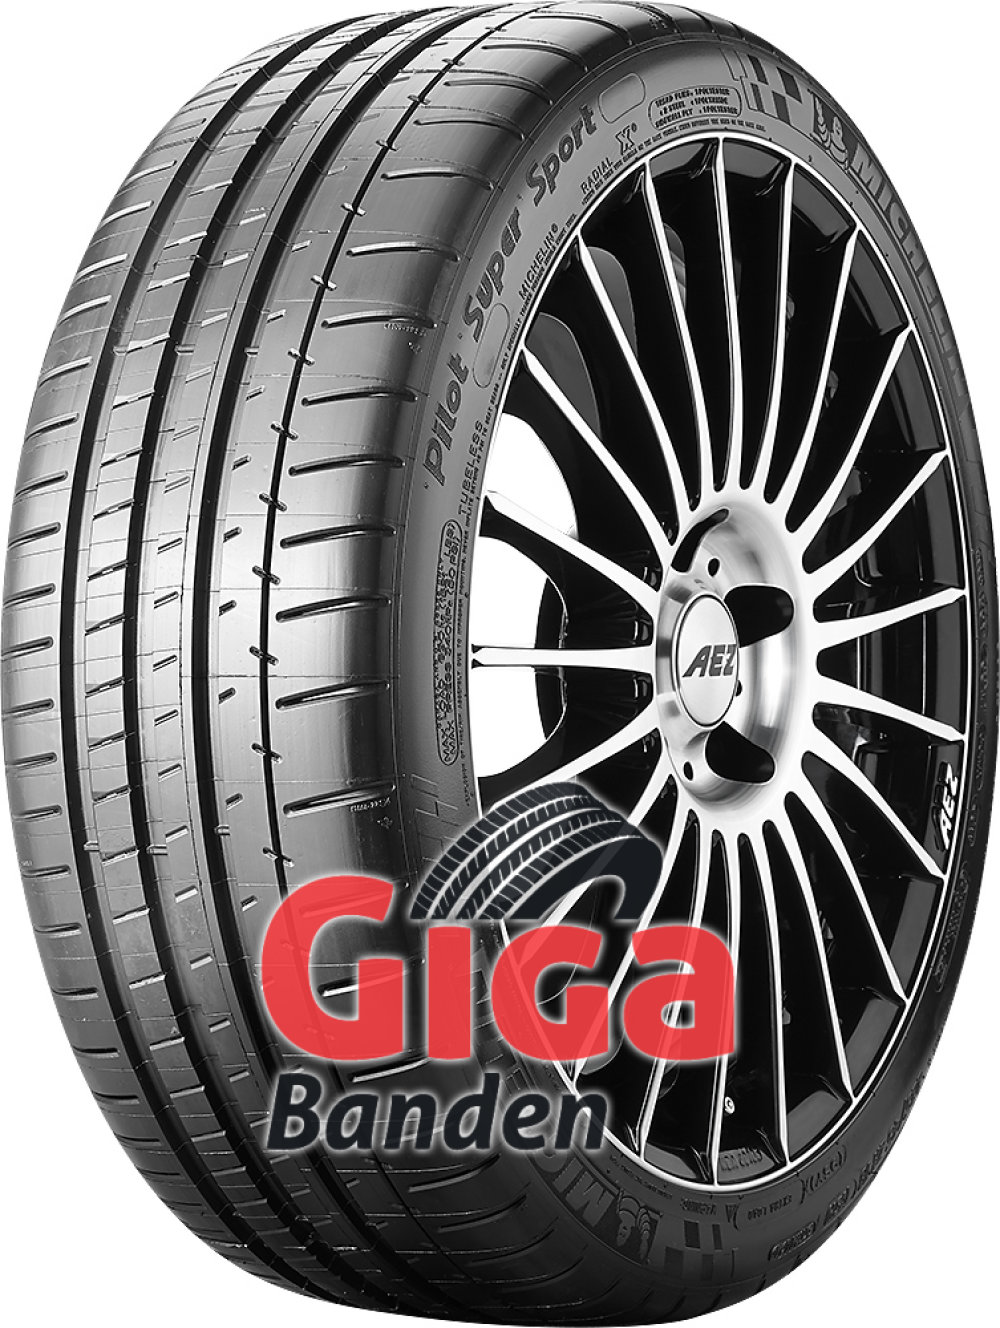 Michelin Pilot Super Sport ( 265/45 ZR18 (101Y) met wangbescherming (FSL) )